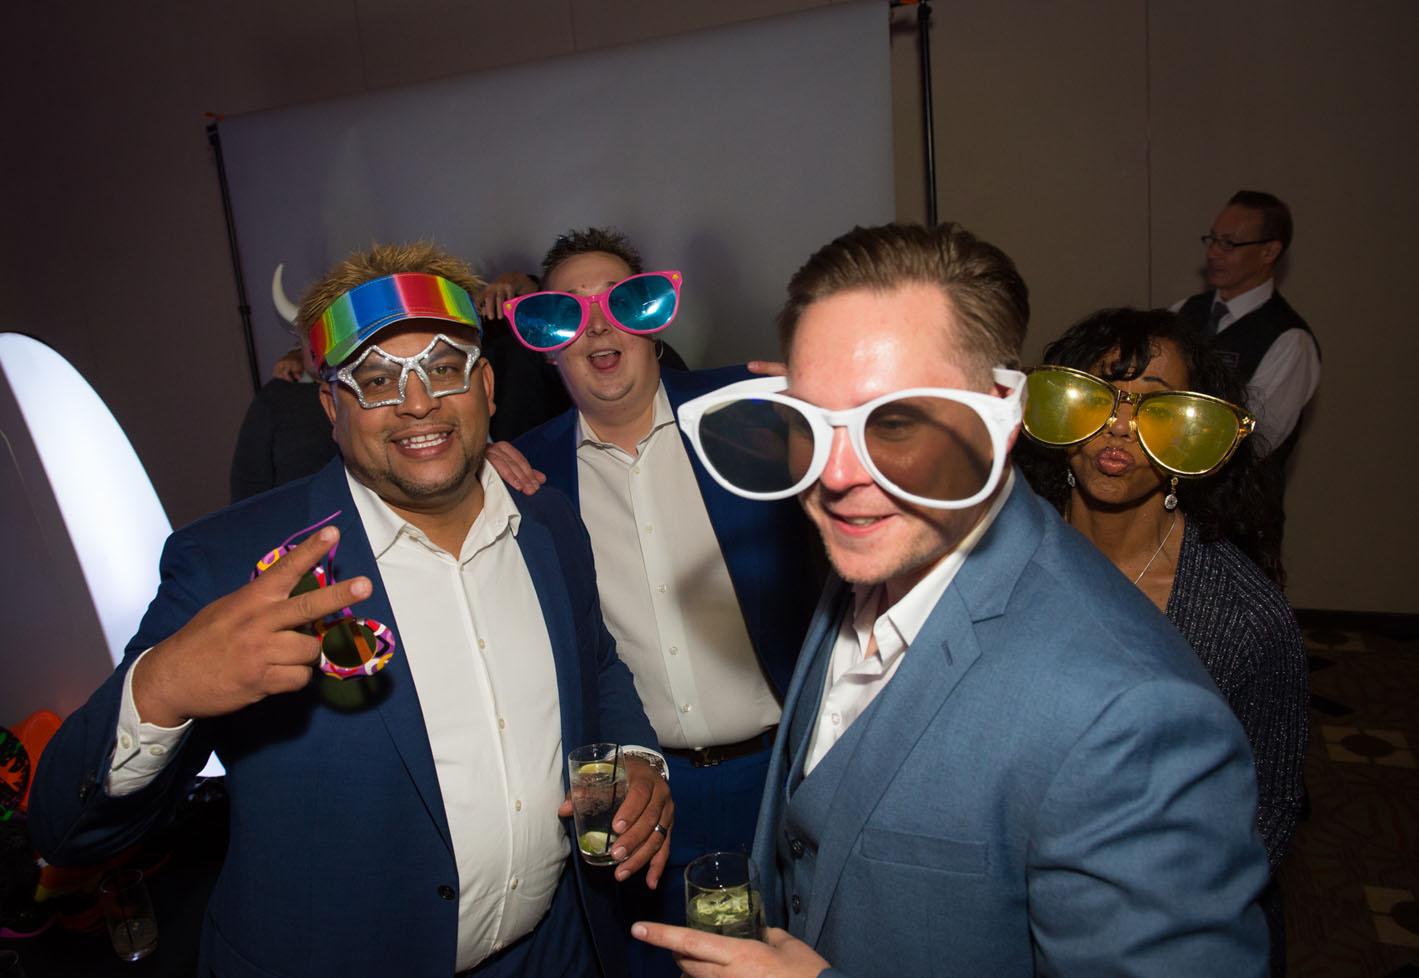 2015-12-09 ReMax Corpoarte Event - The Borgata - Atlantic City NJ - Photo Sesh - 2015-5347.jpg